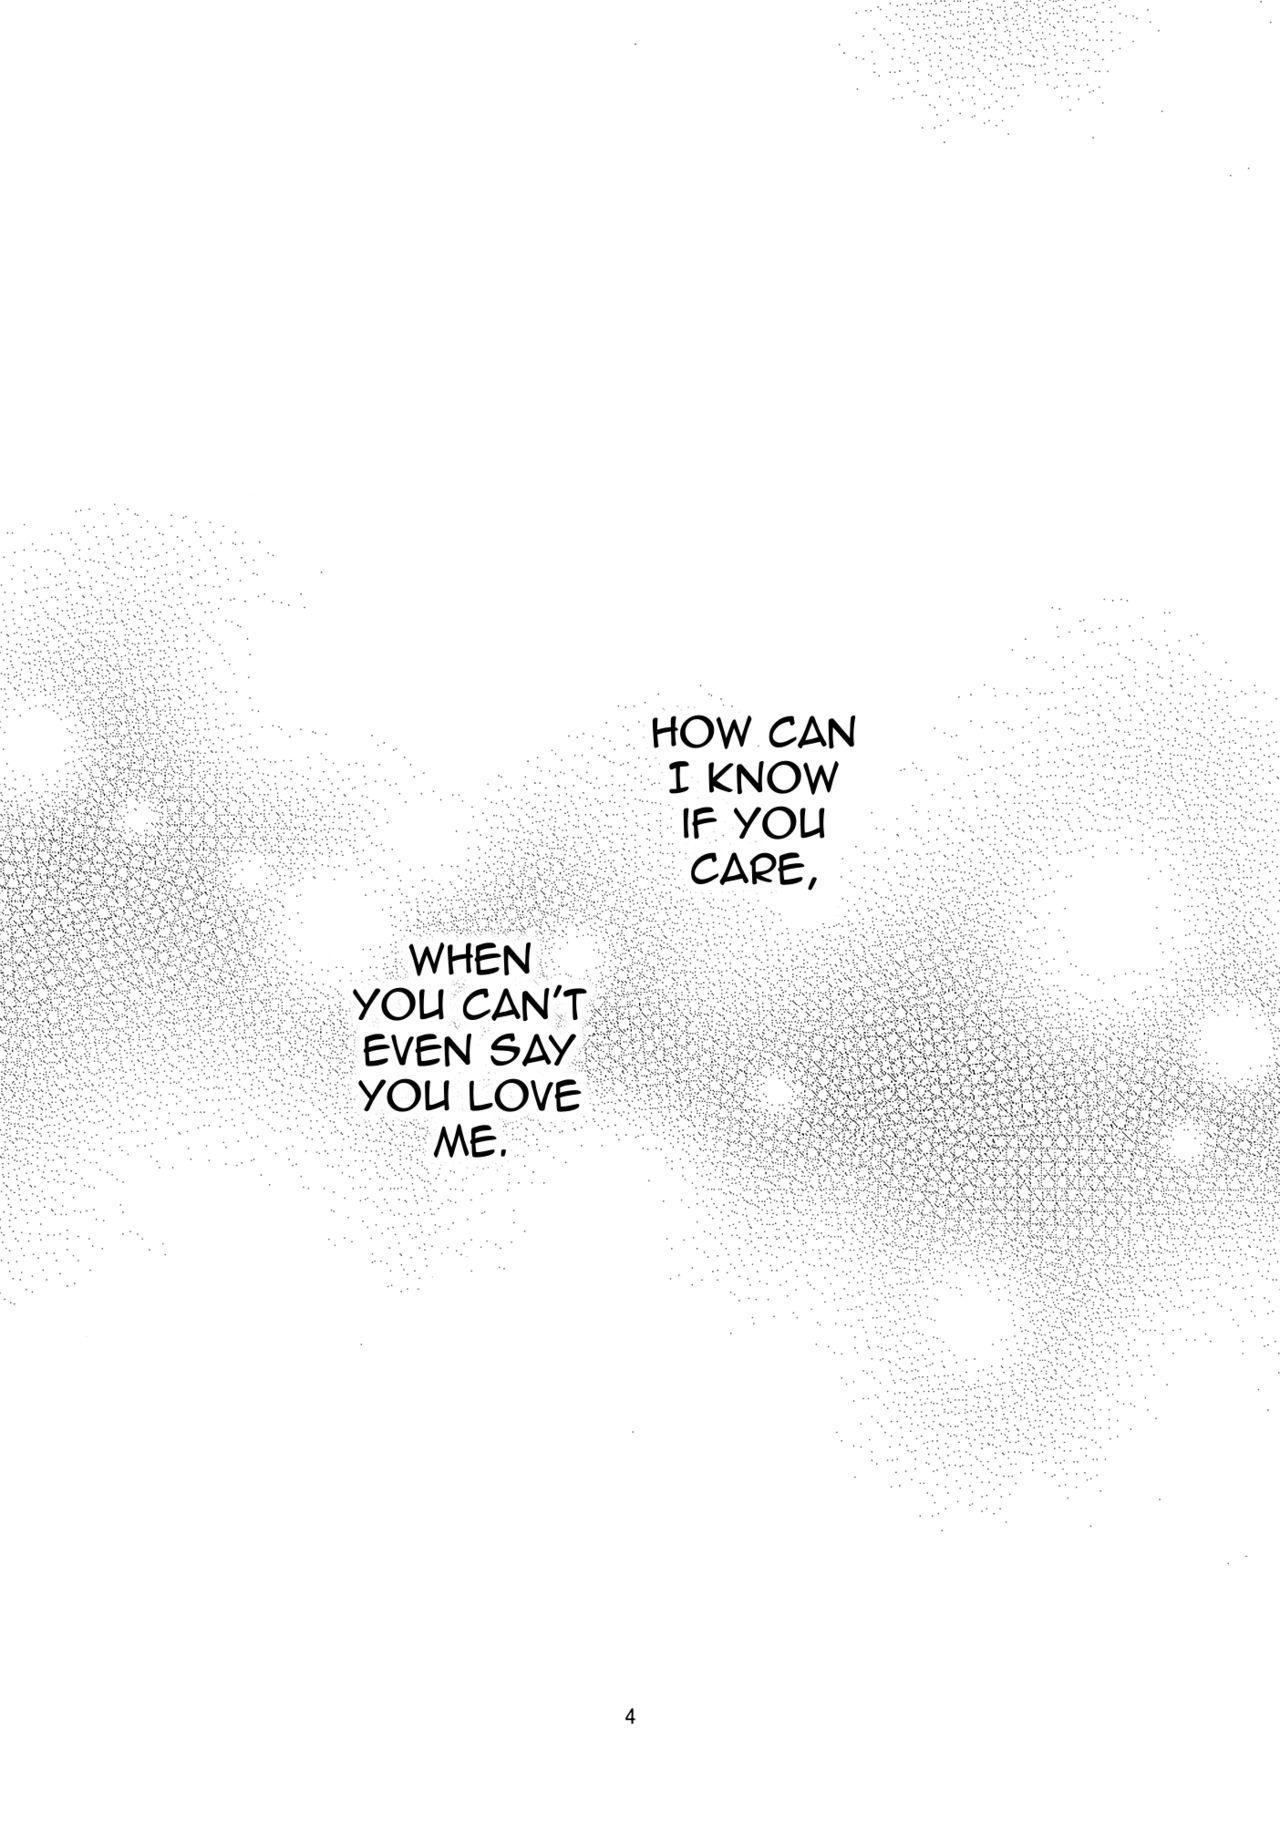 Sozoro na Ai no Kakushikata. | How can I hide this drowning love? 2